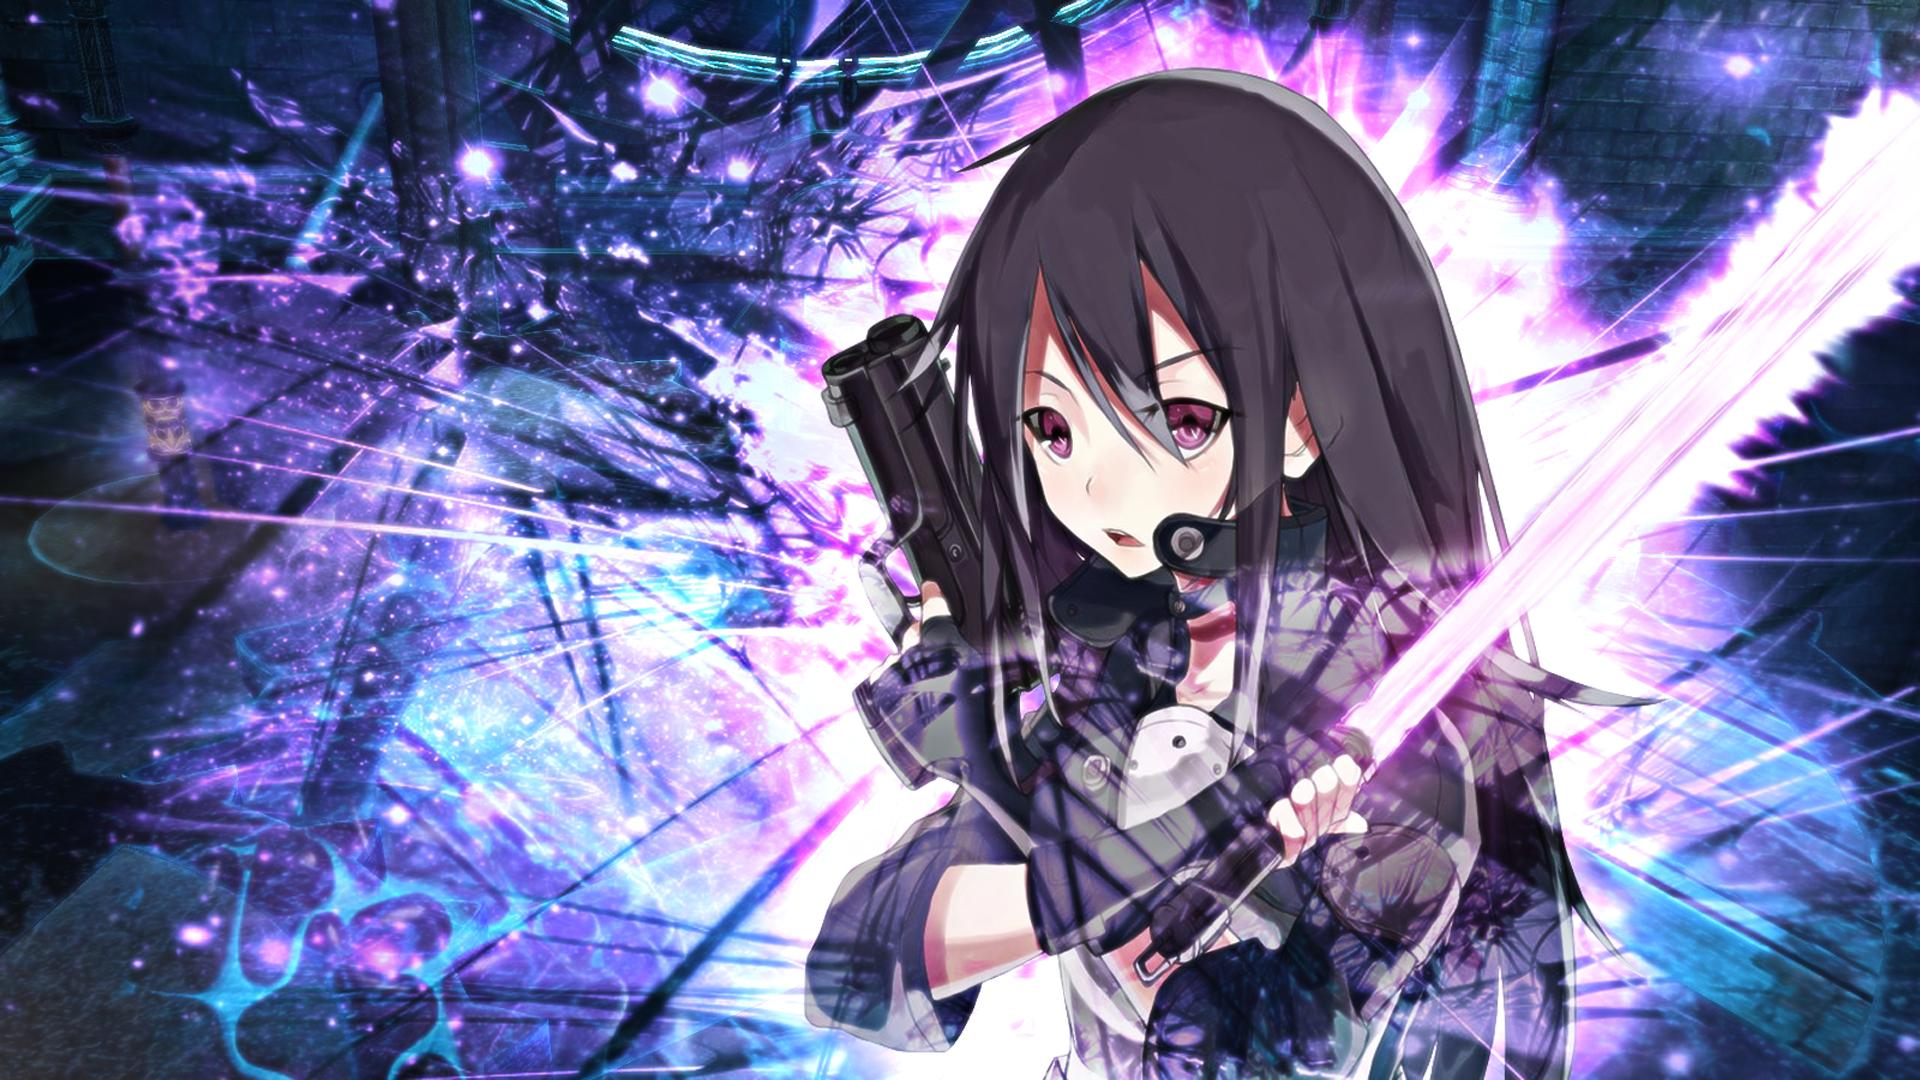 kirito gun gale online phantom bullet arc sword art online